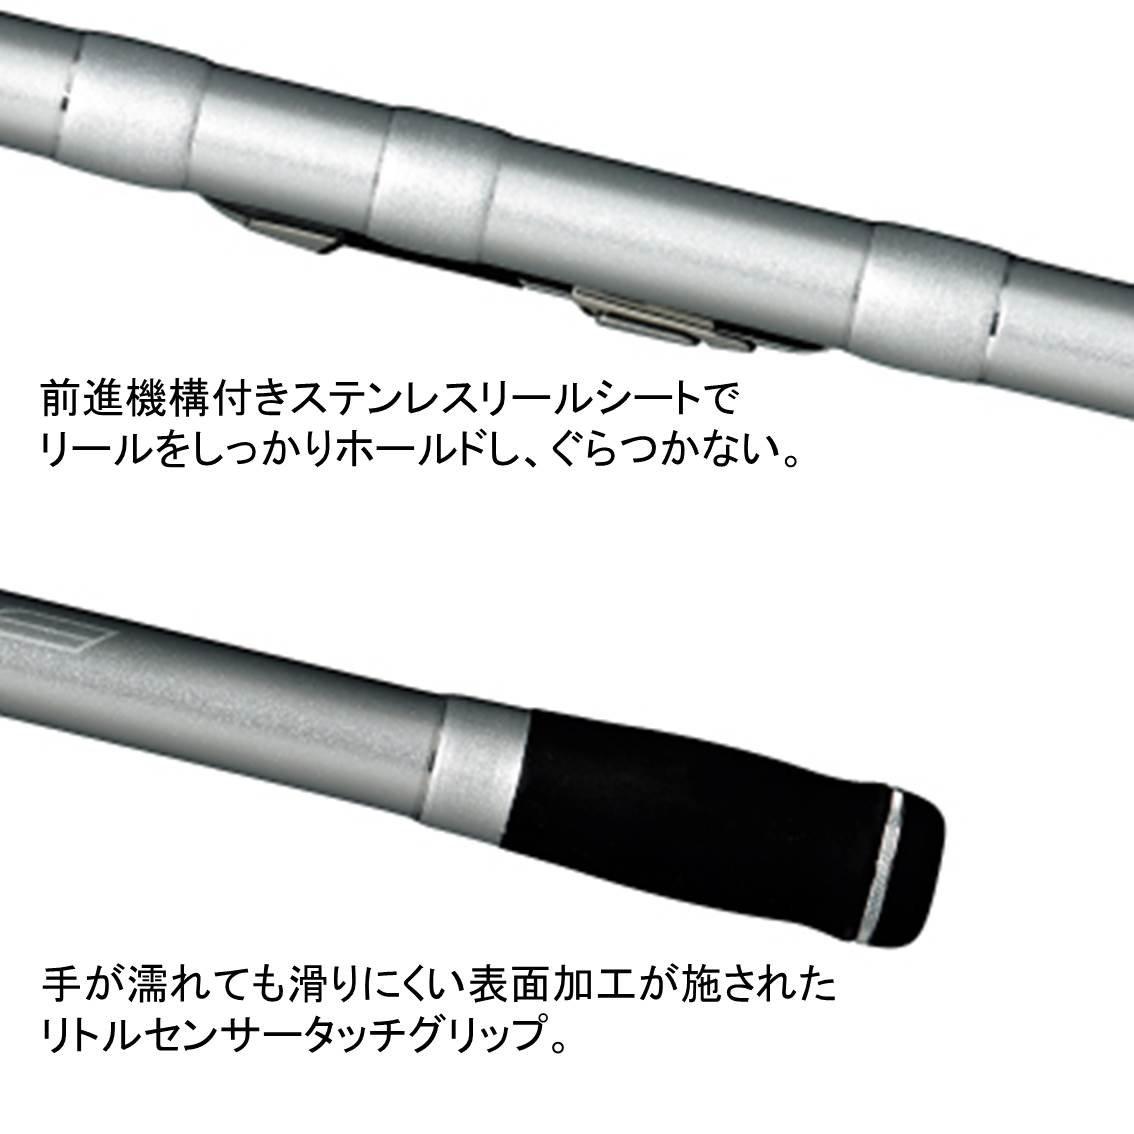 Daiwa Prime SURF T 33-405-W